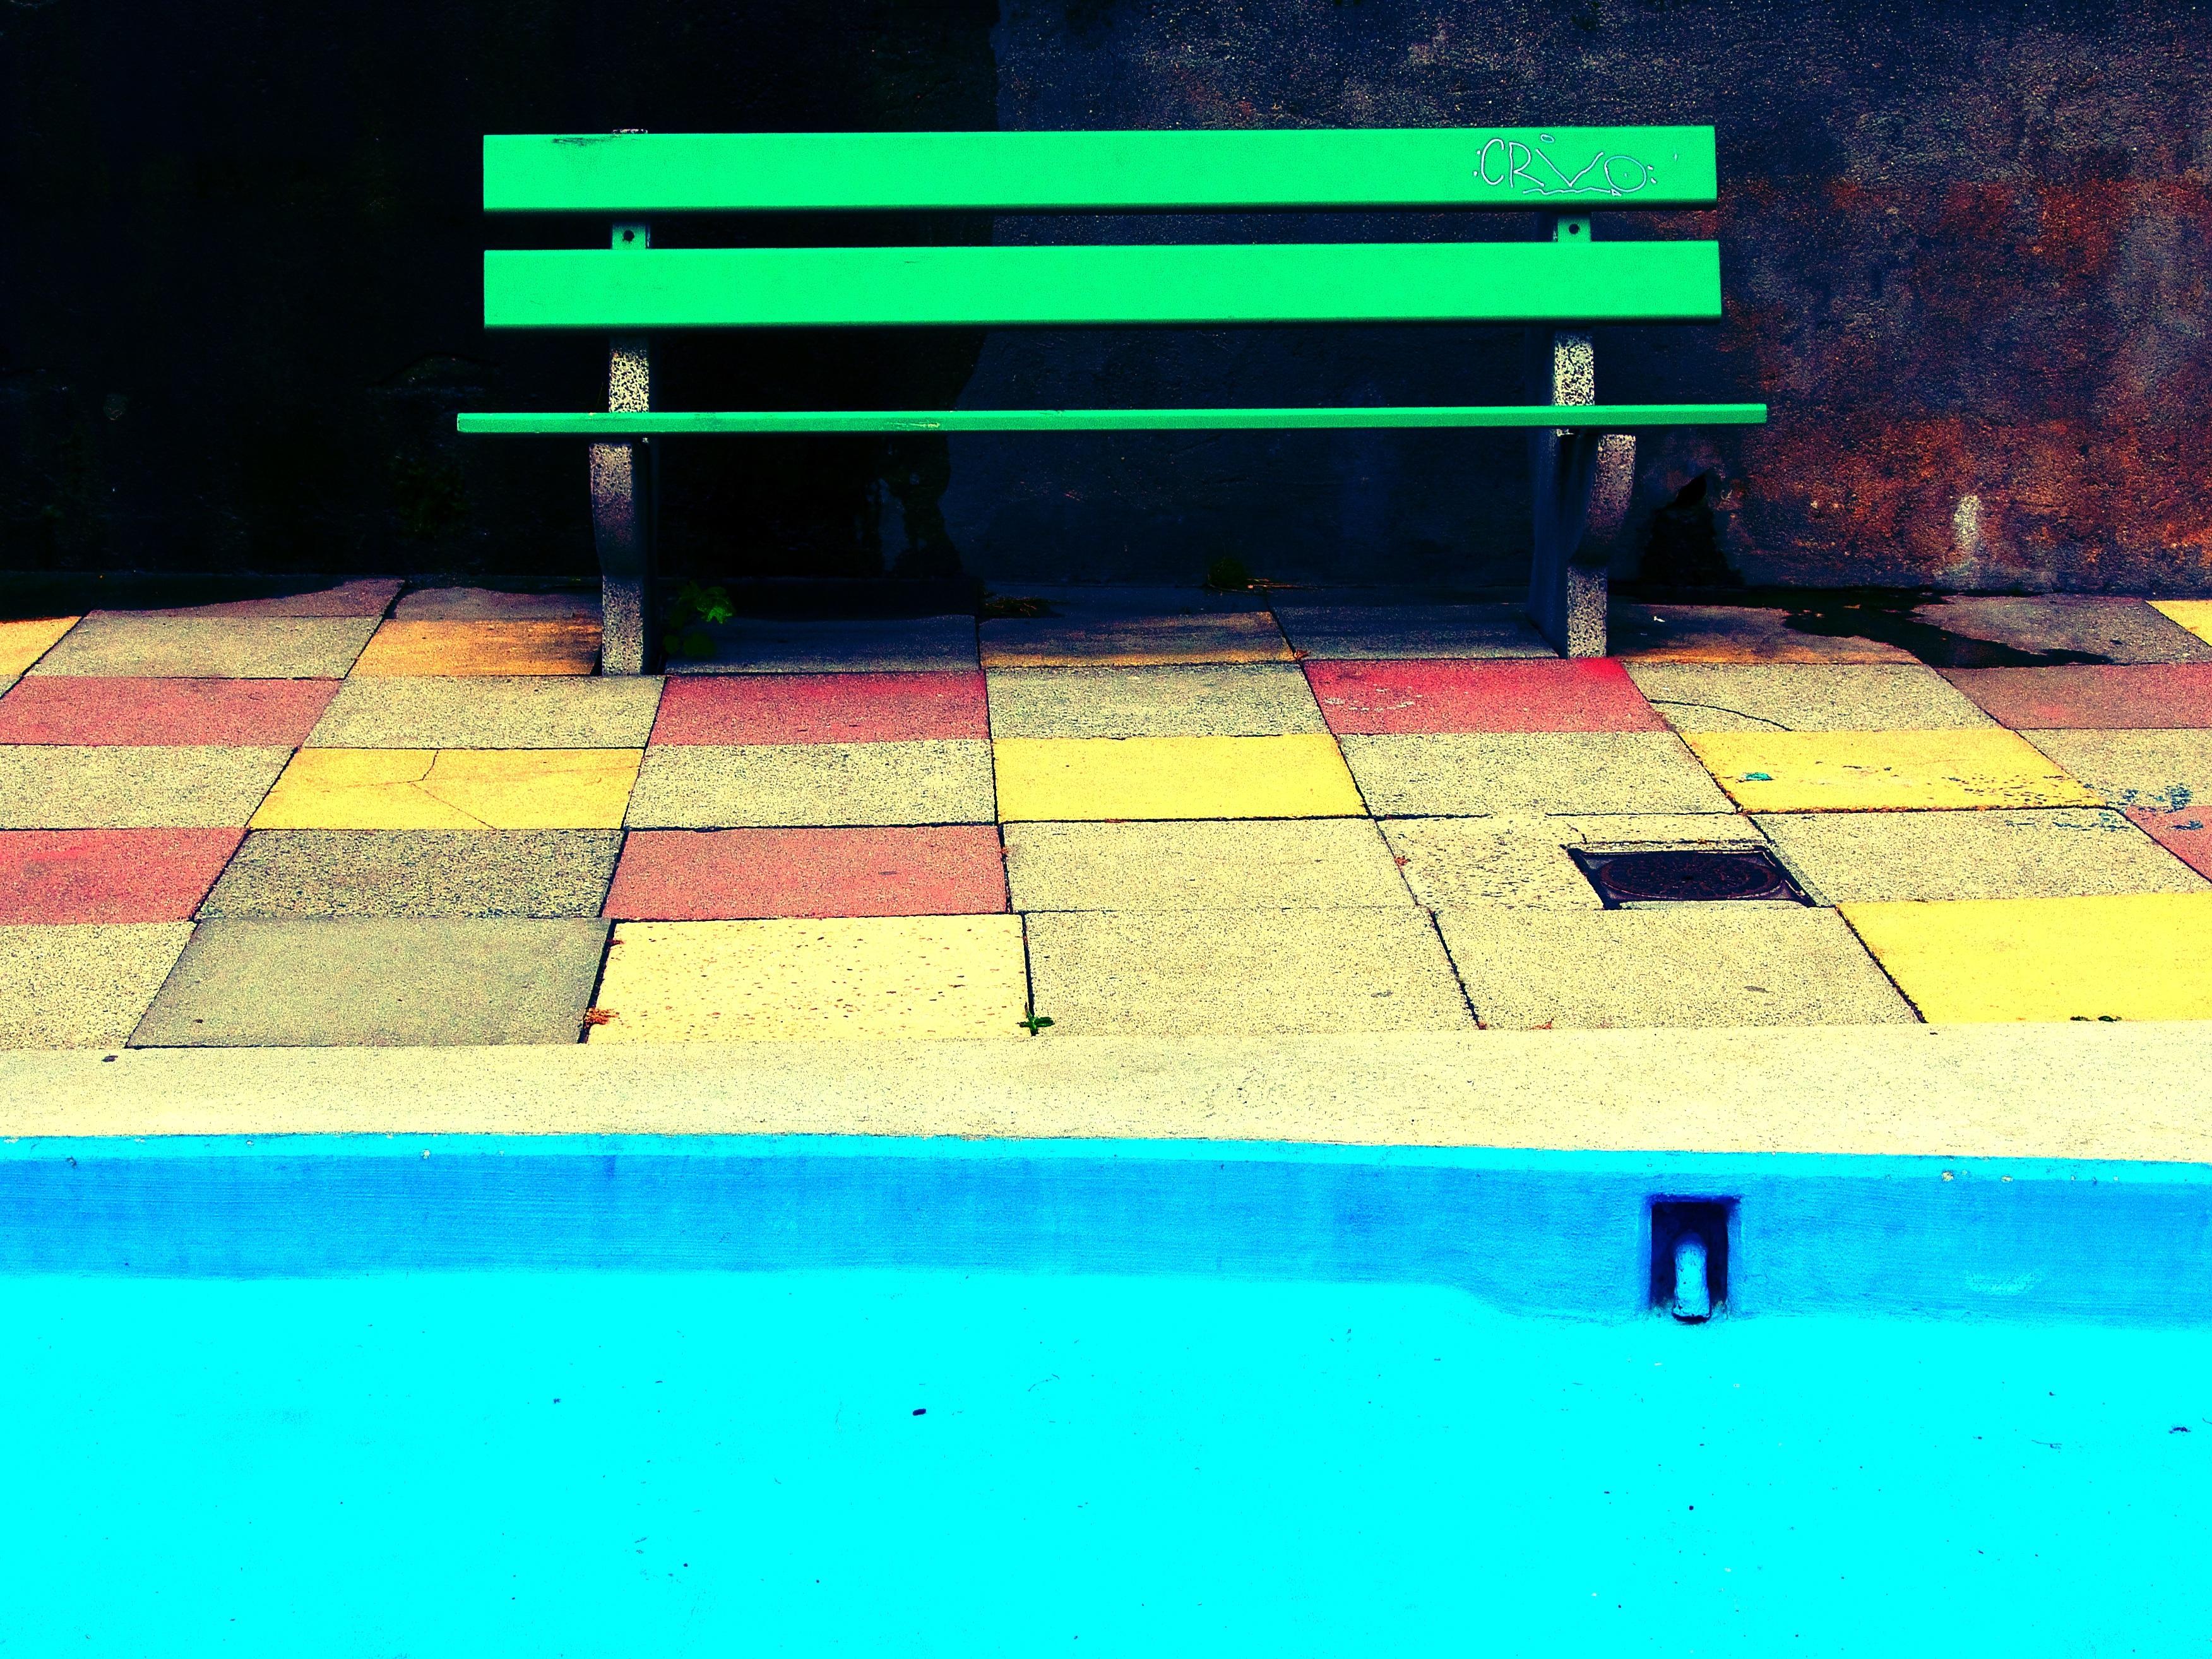 Structure Bench Floor Pool Green Color Blue Furniture Art Bright Tiles Shape Flooring Sport Venue